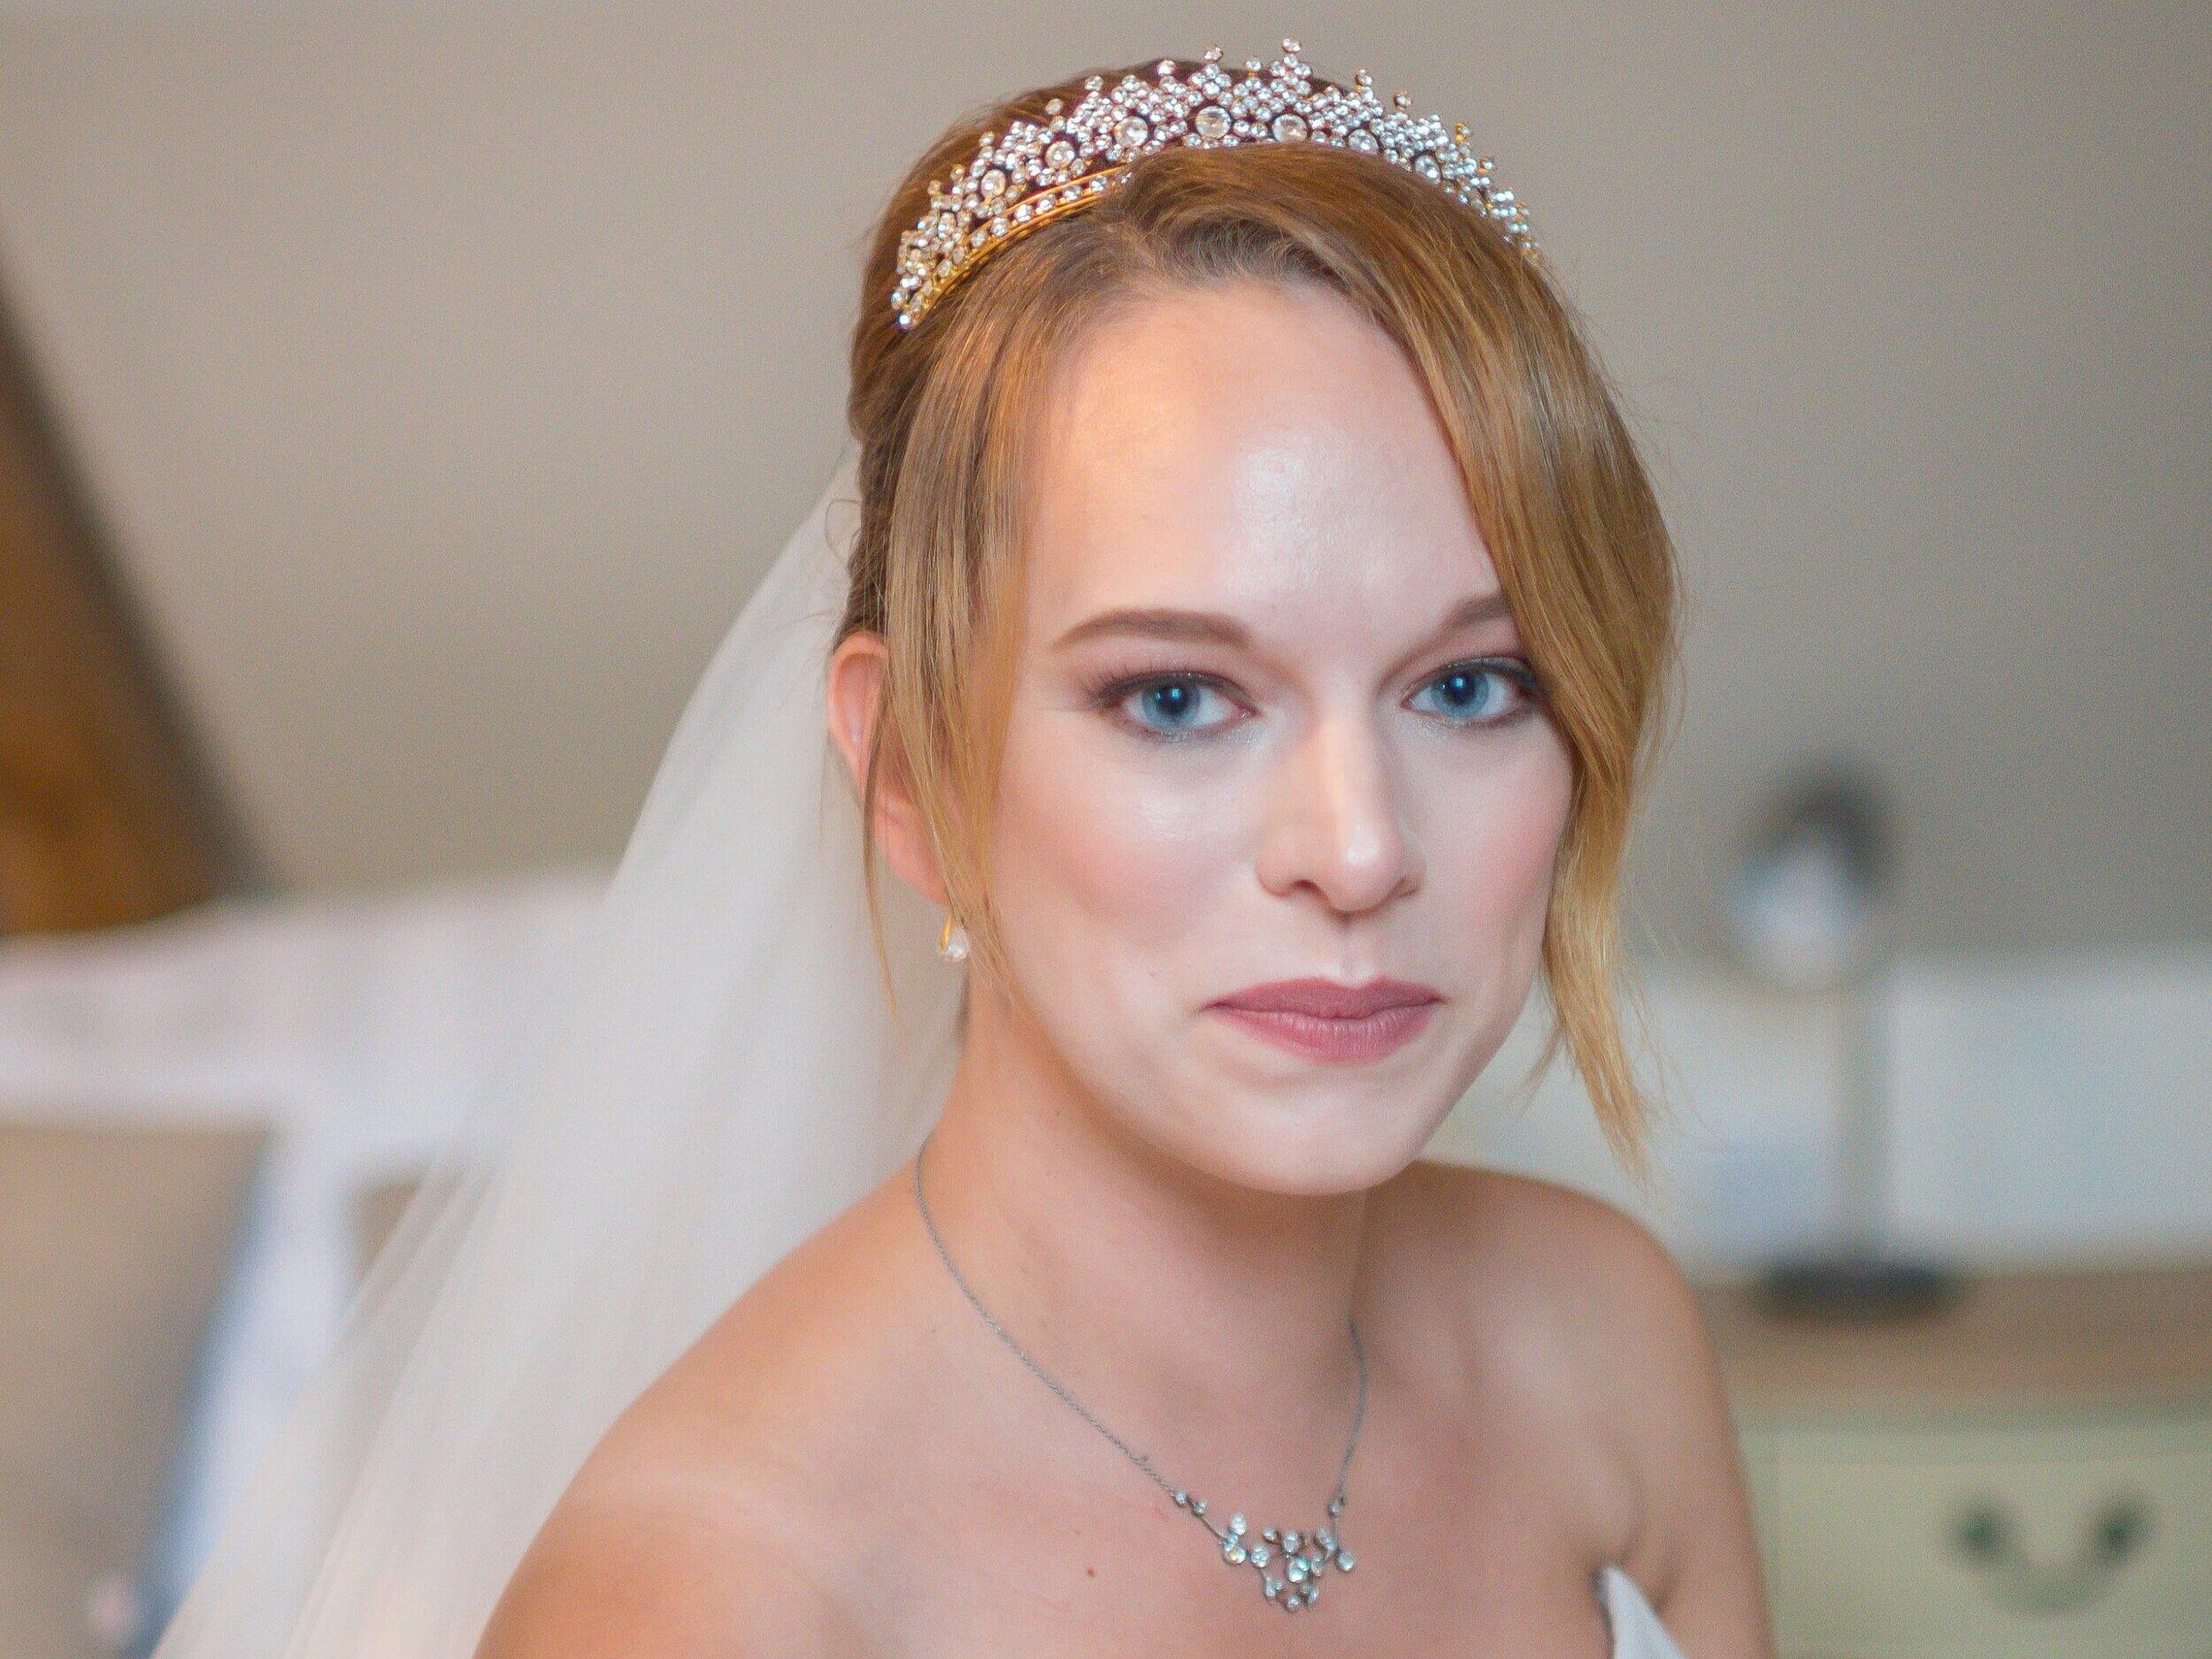 Stephanie Alexandra Bridal Hair and Makeup Services Destination Wedding Makeup Lesson